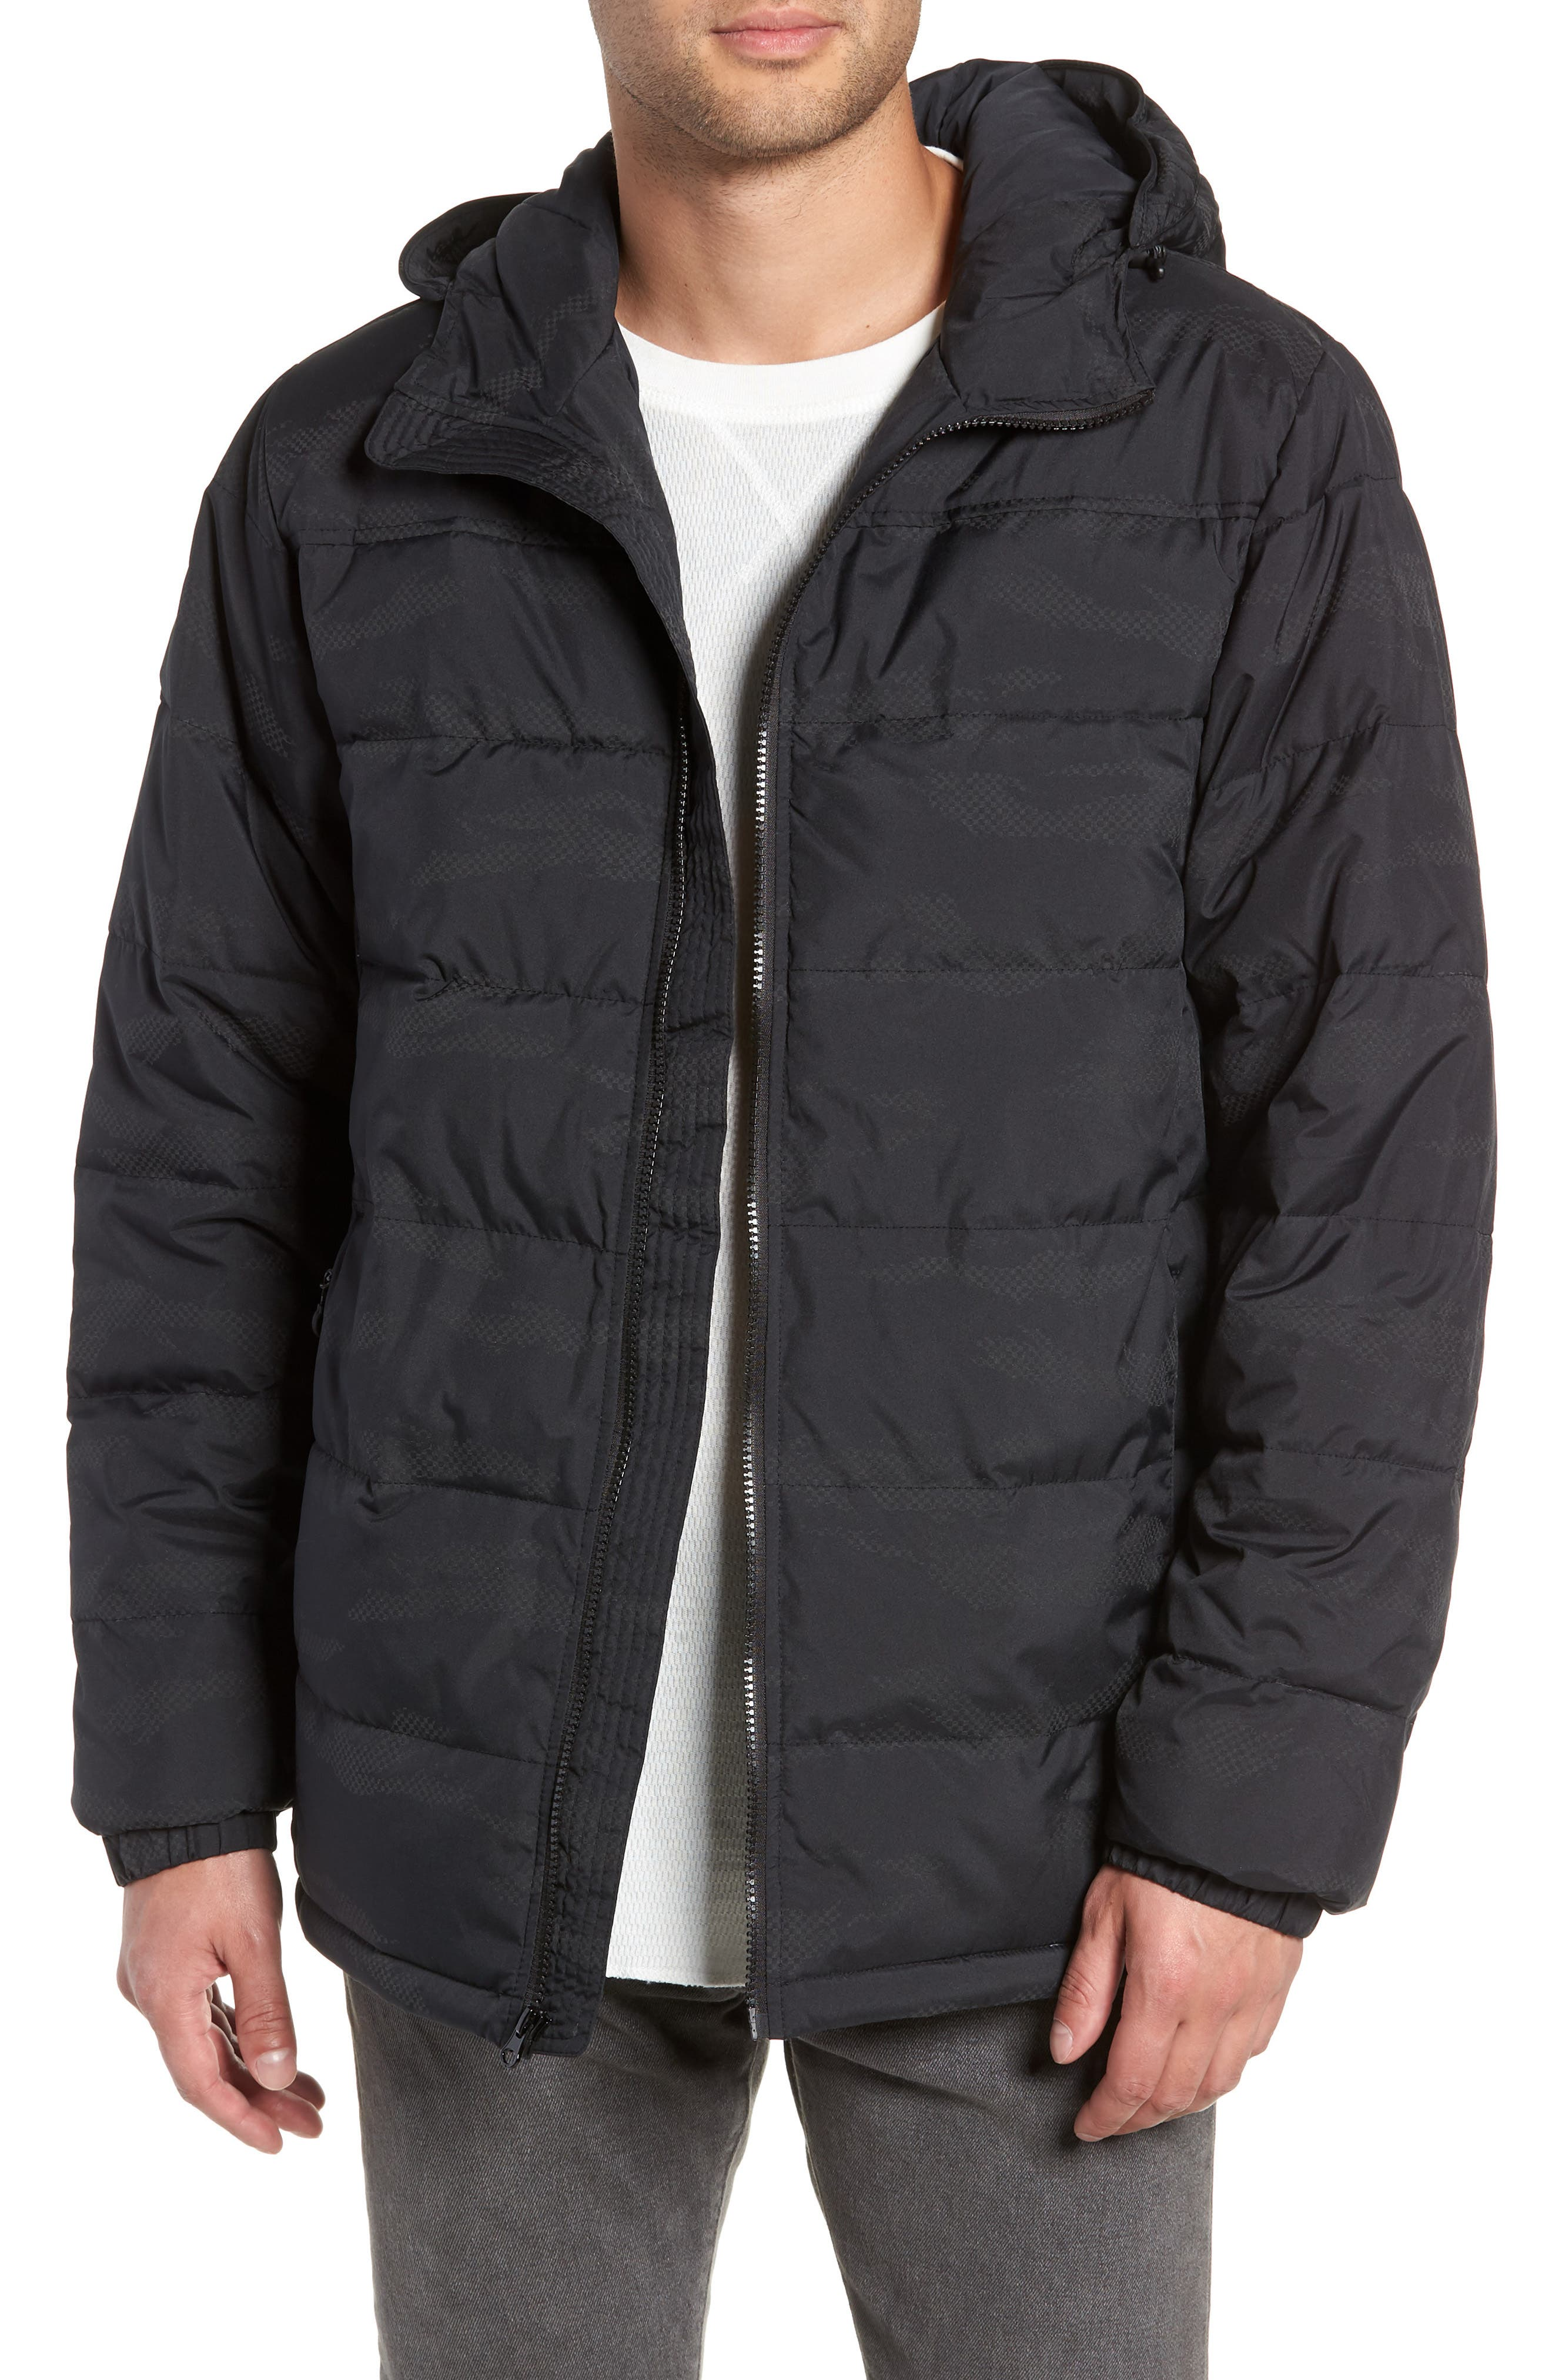 Woodcrest MTE Jacket,                         Main,                         color, BLACK REFLECTIVE